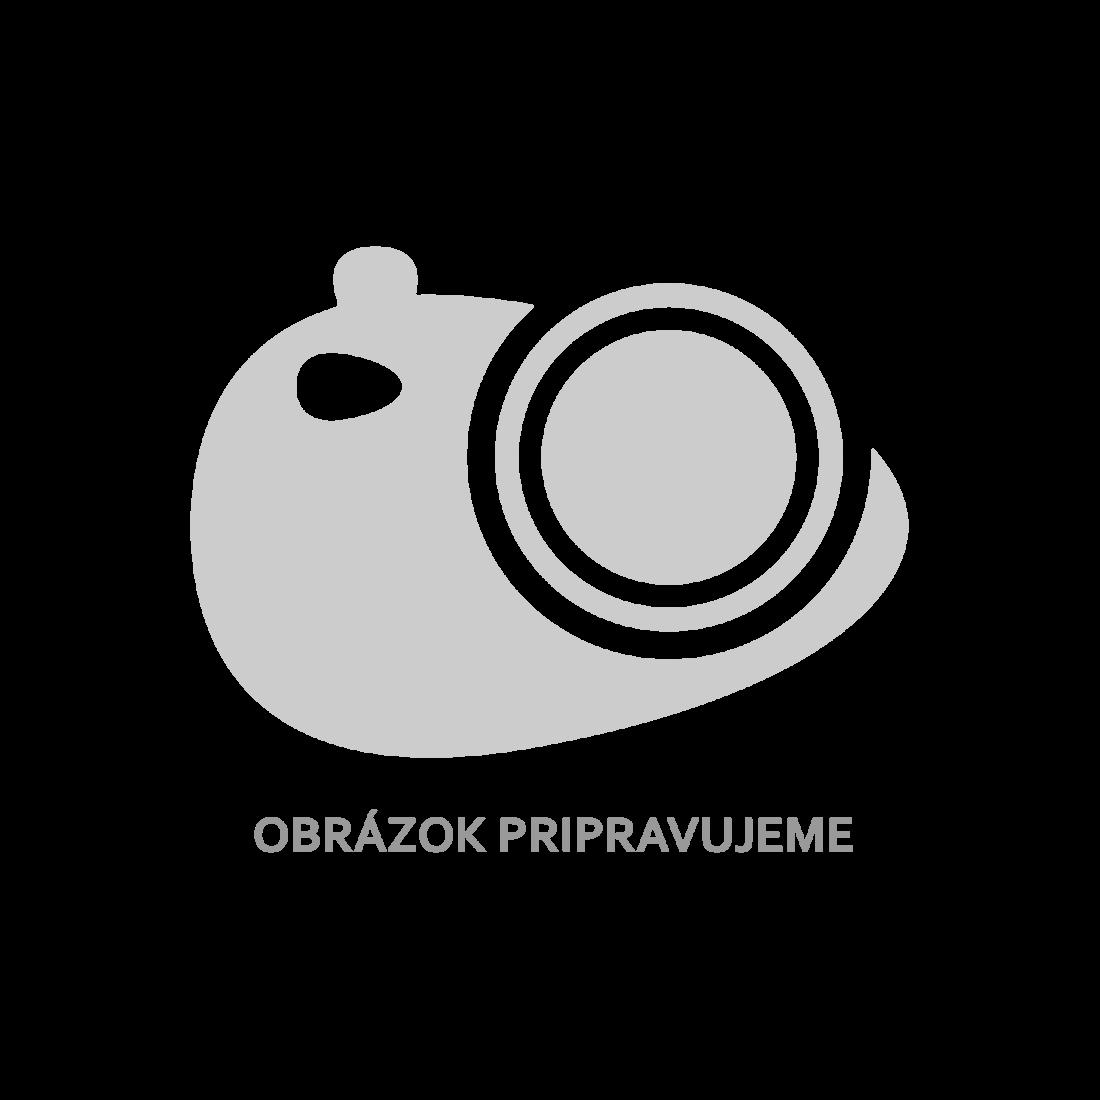 Poštová schránka s potlačou Abstract Manhattan Bridge